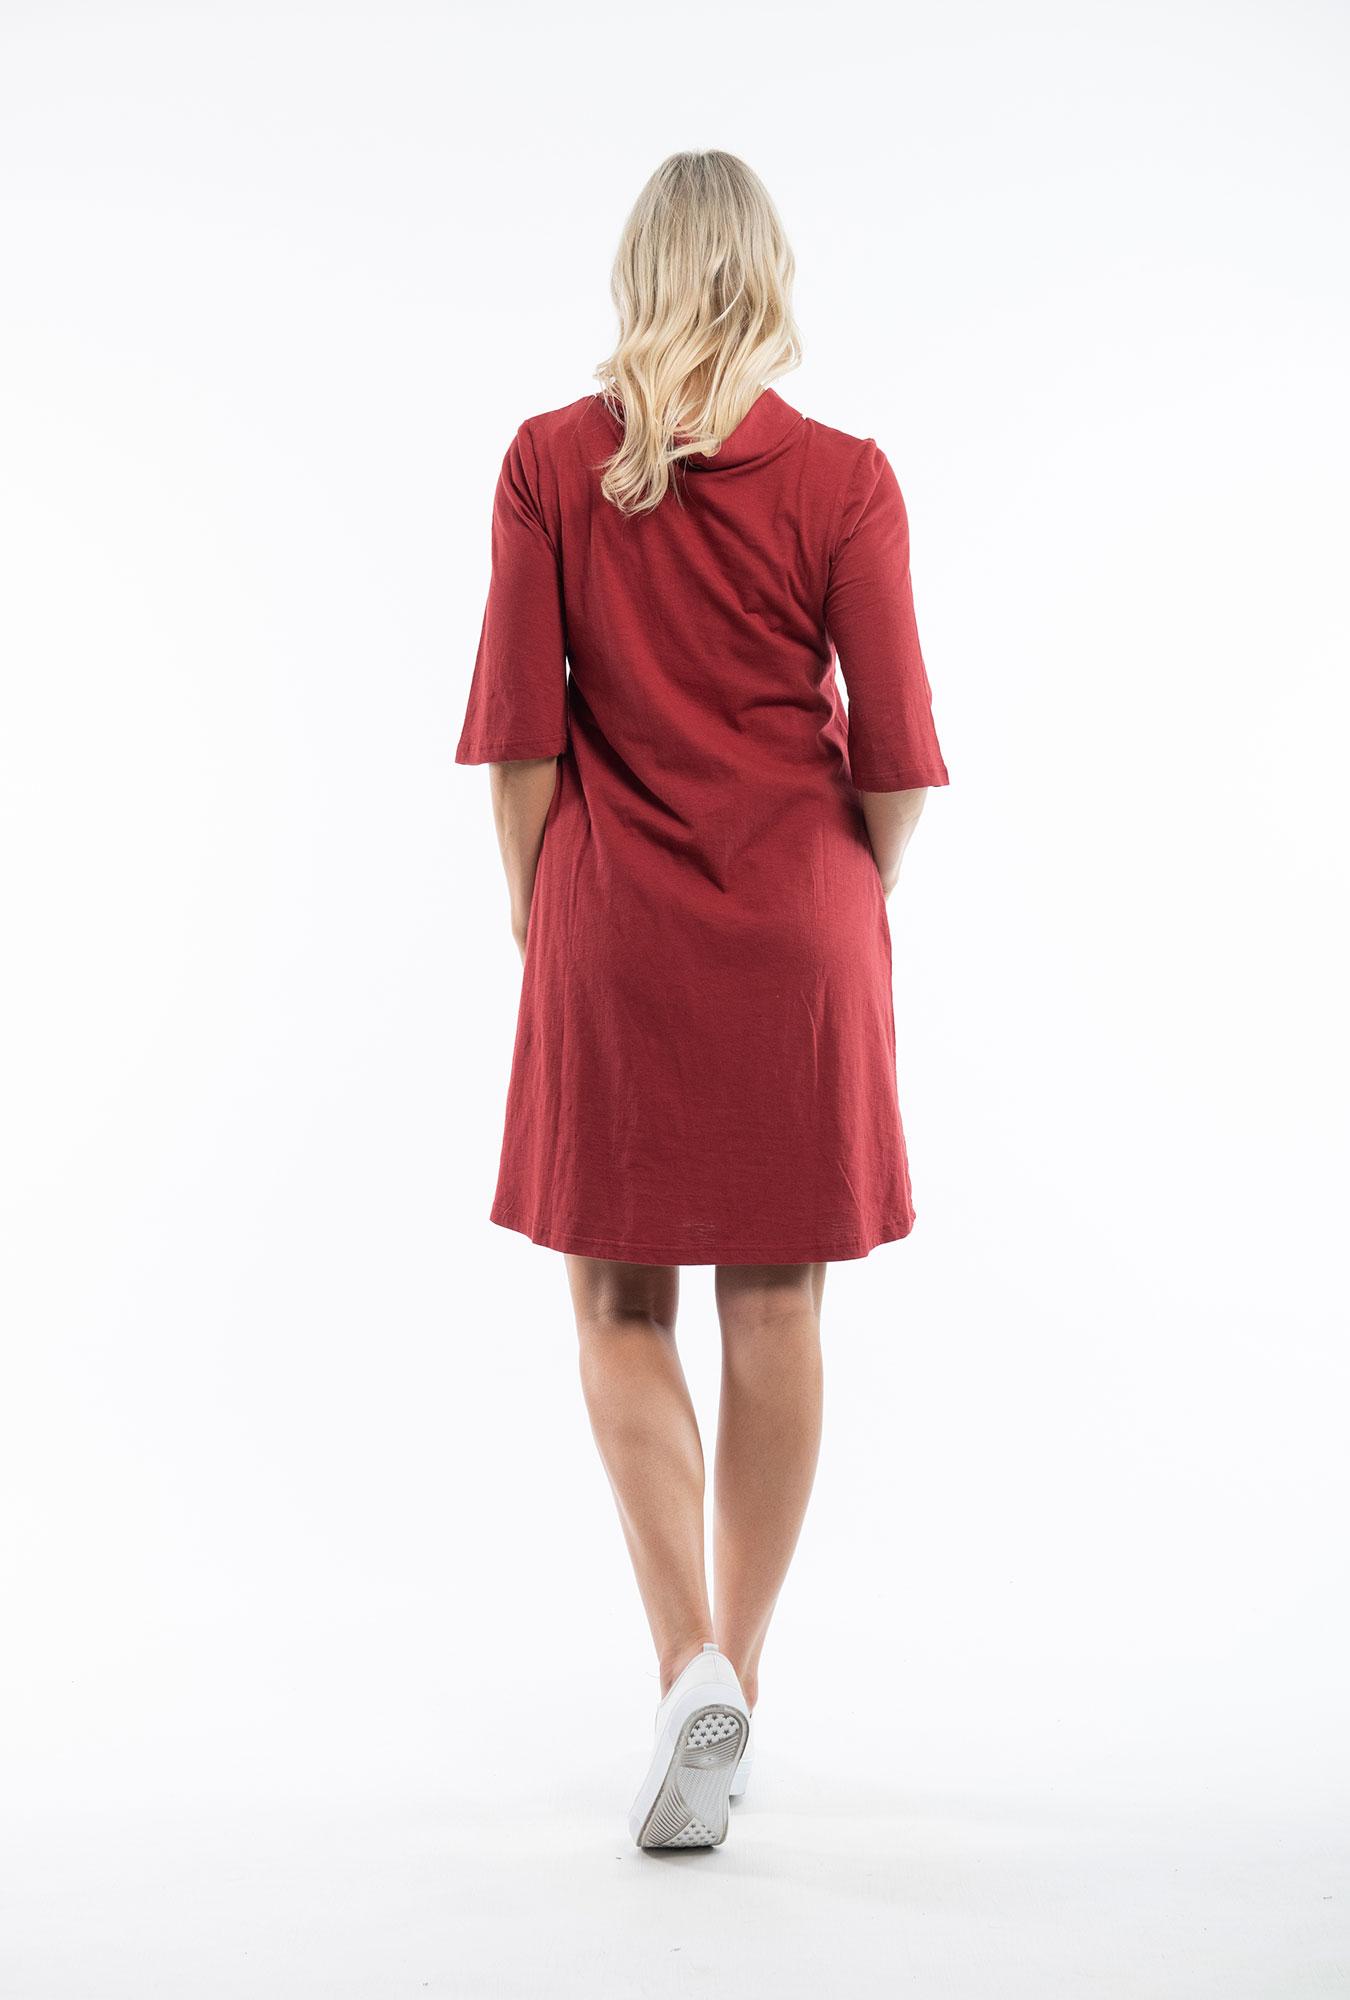 Rosewood Cowel Dress